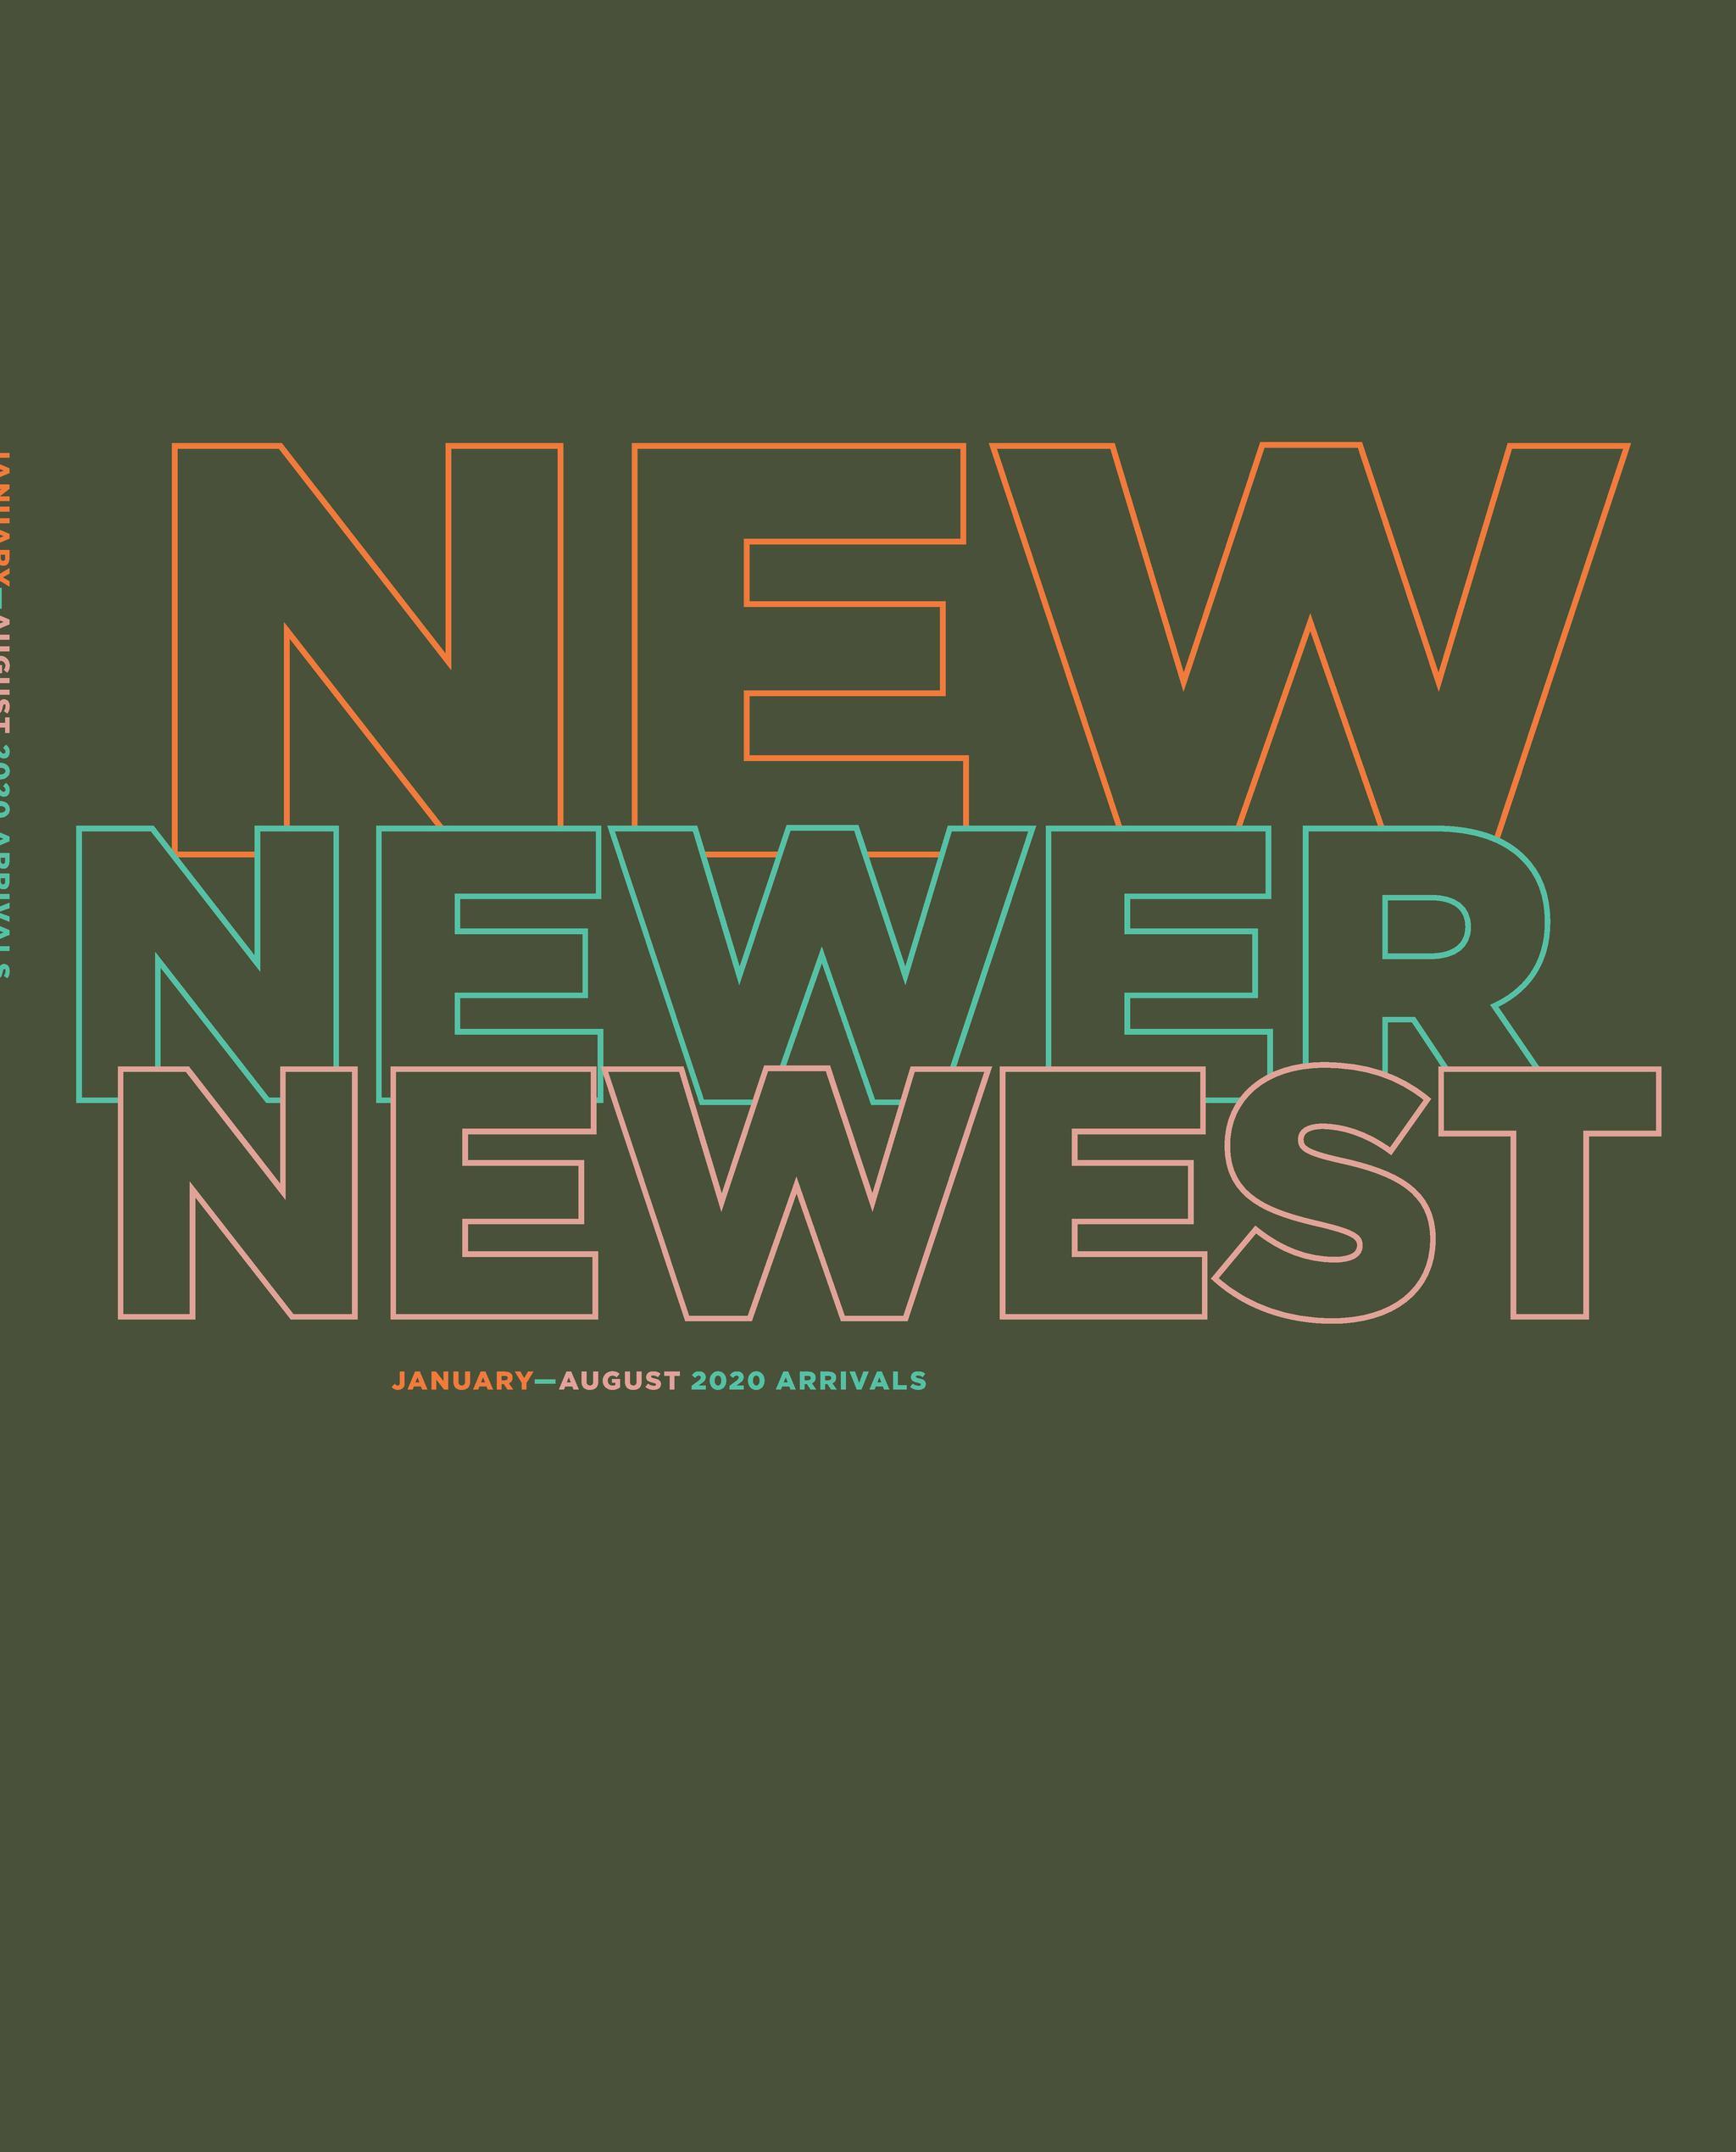 New Newer Newest